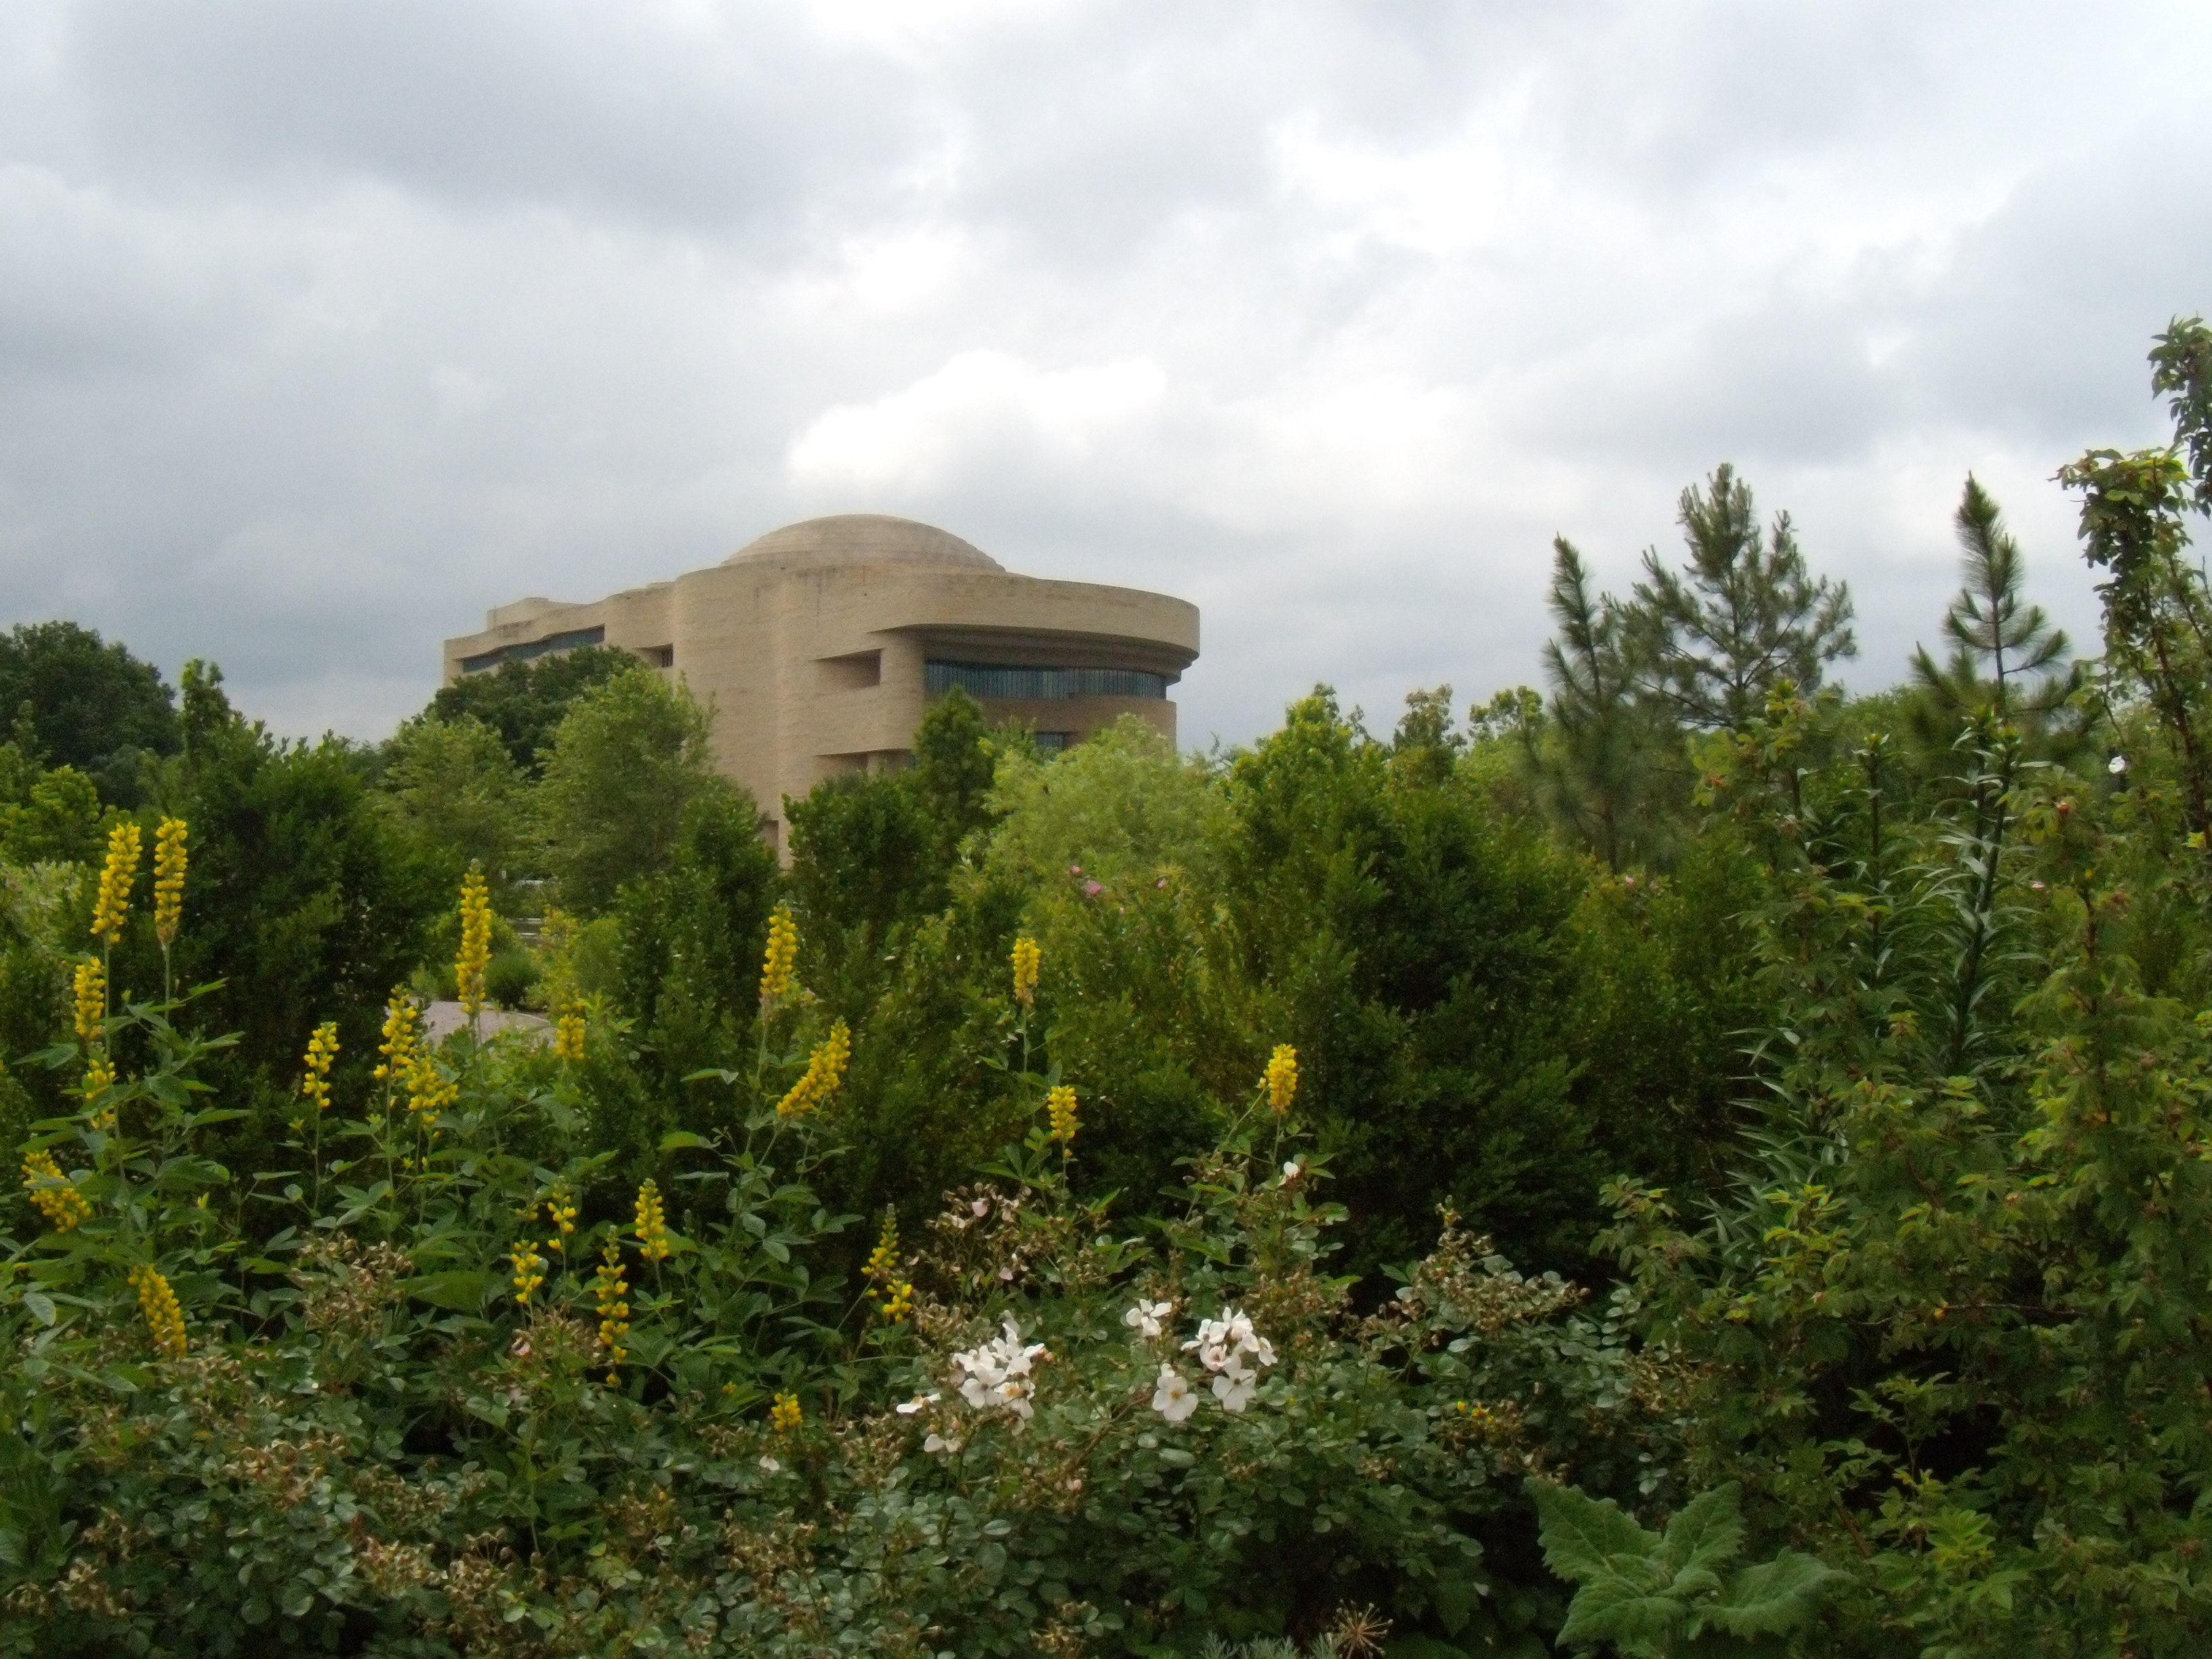 View from the U.S. Botanic Garden